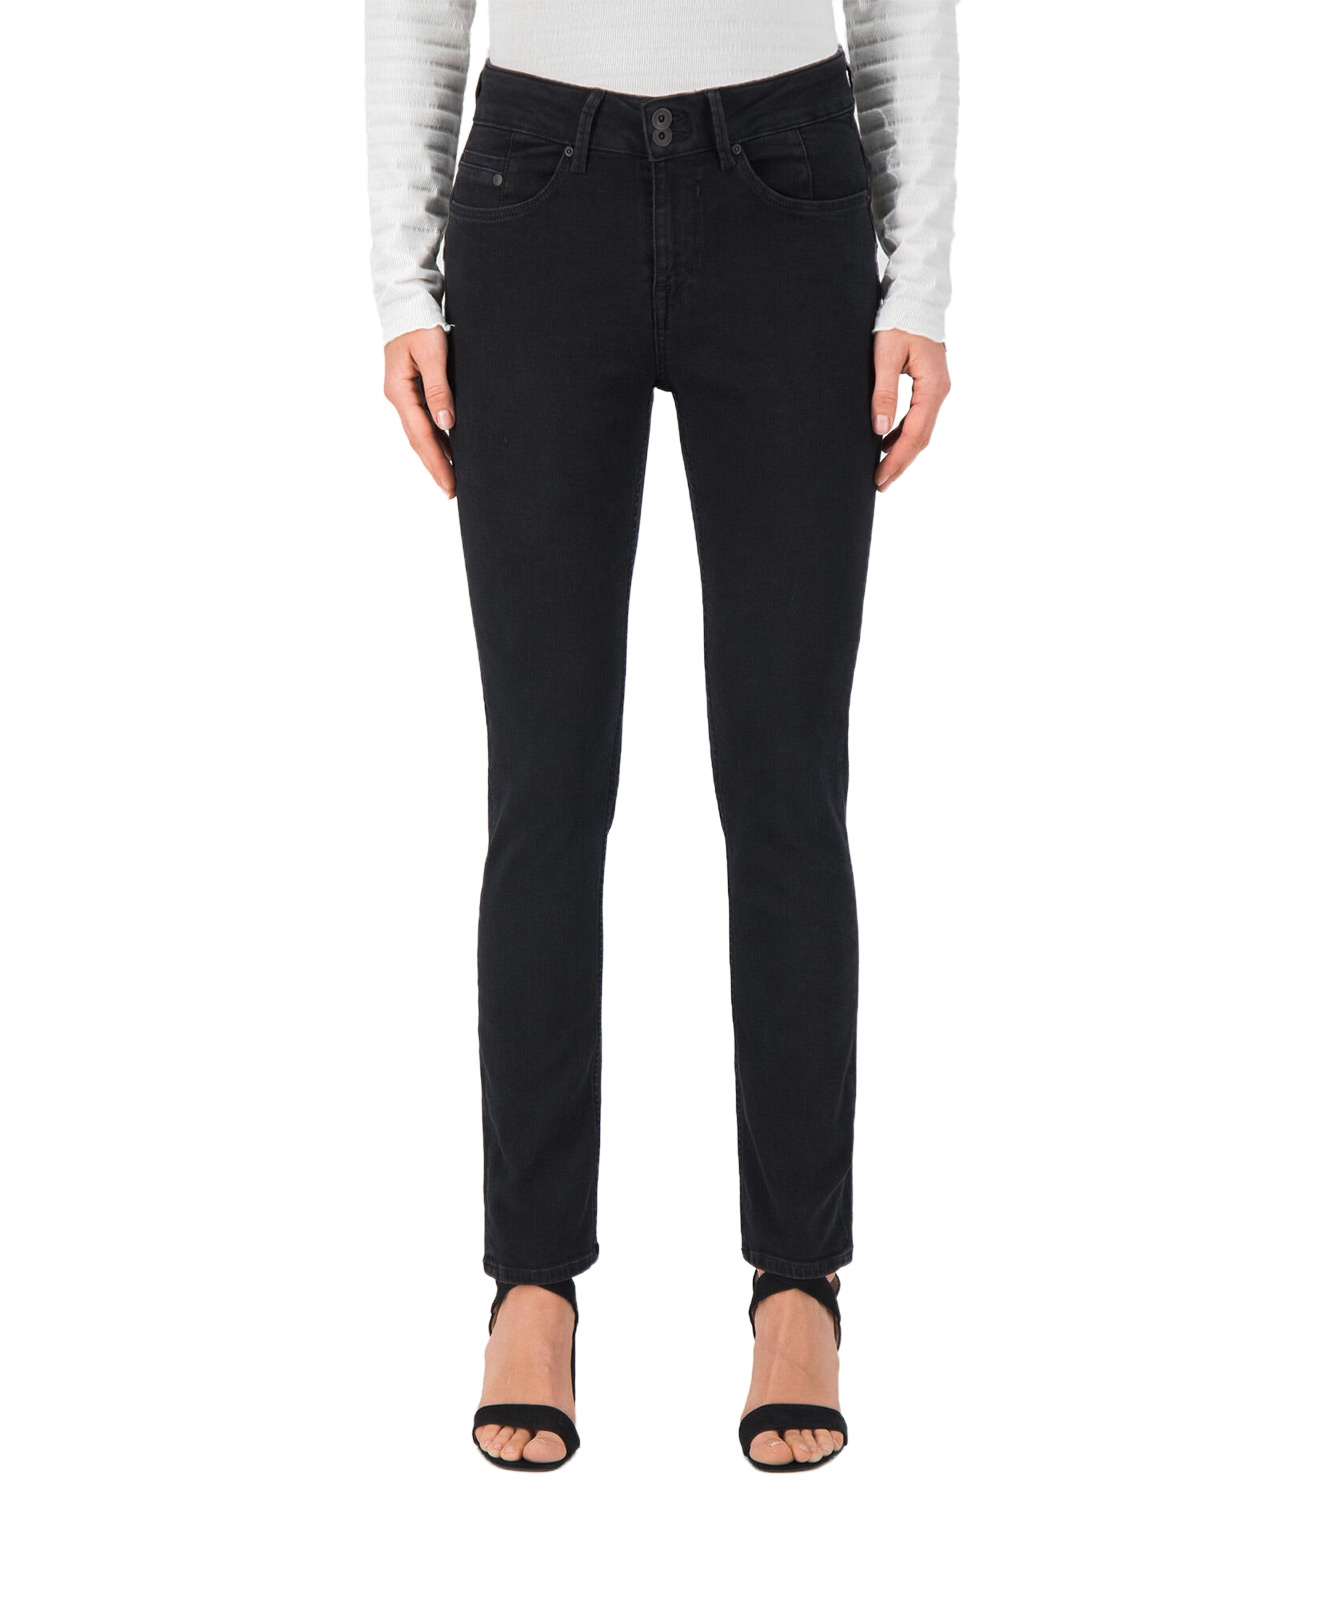 Hosen - Garcia Mom Jeans Caro 285 in Dark Used Black  - Onlineshop Jeans Meile